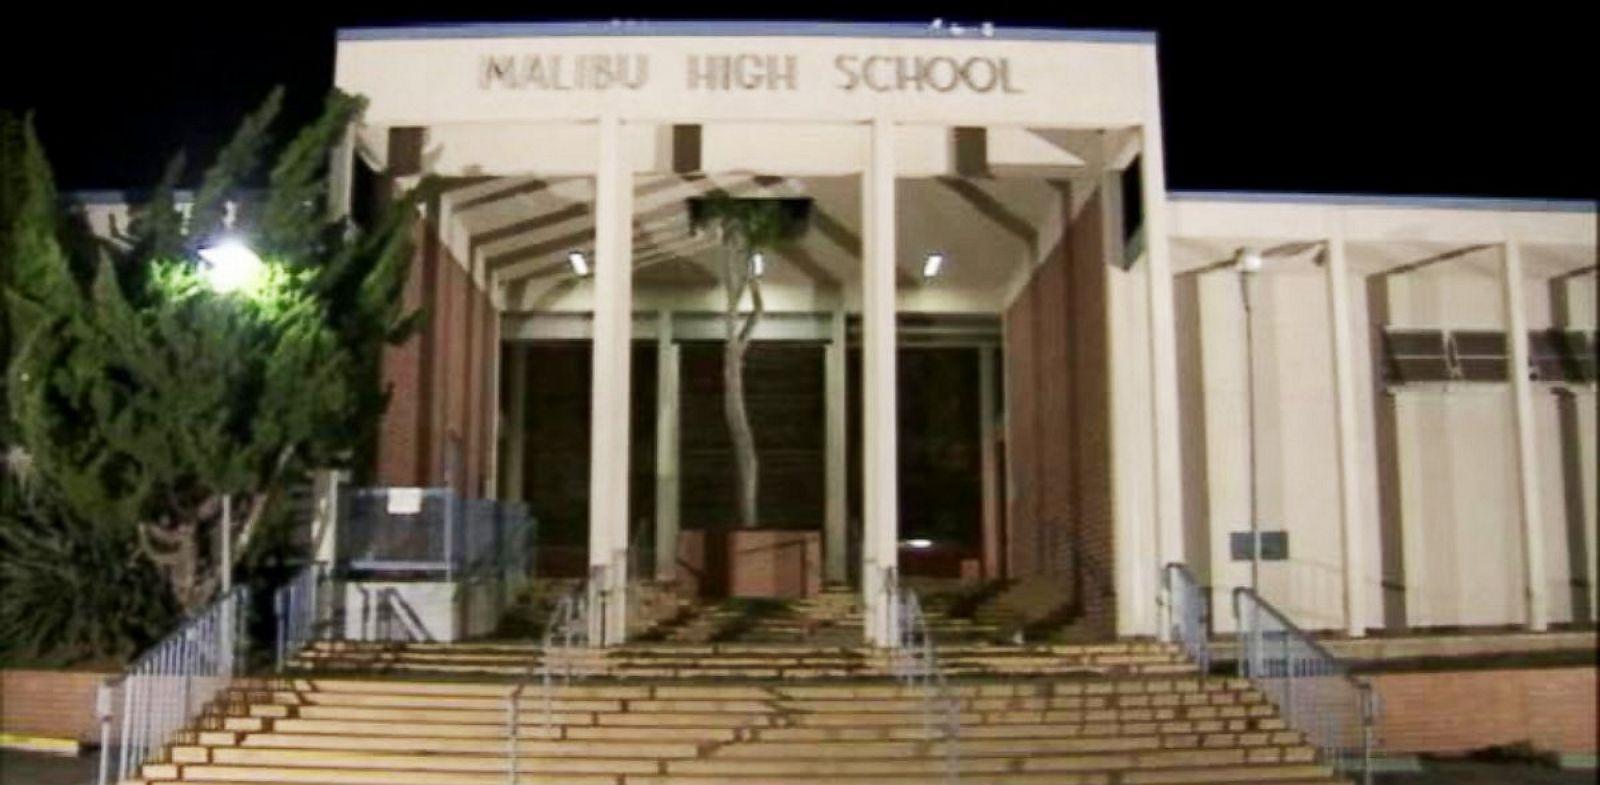 PHOTO: Malibu High School